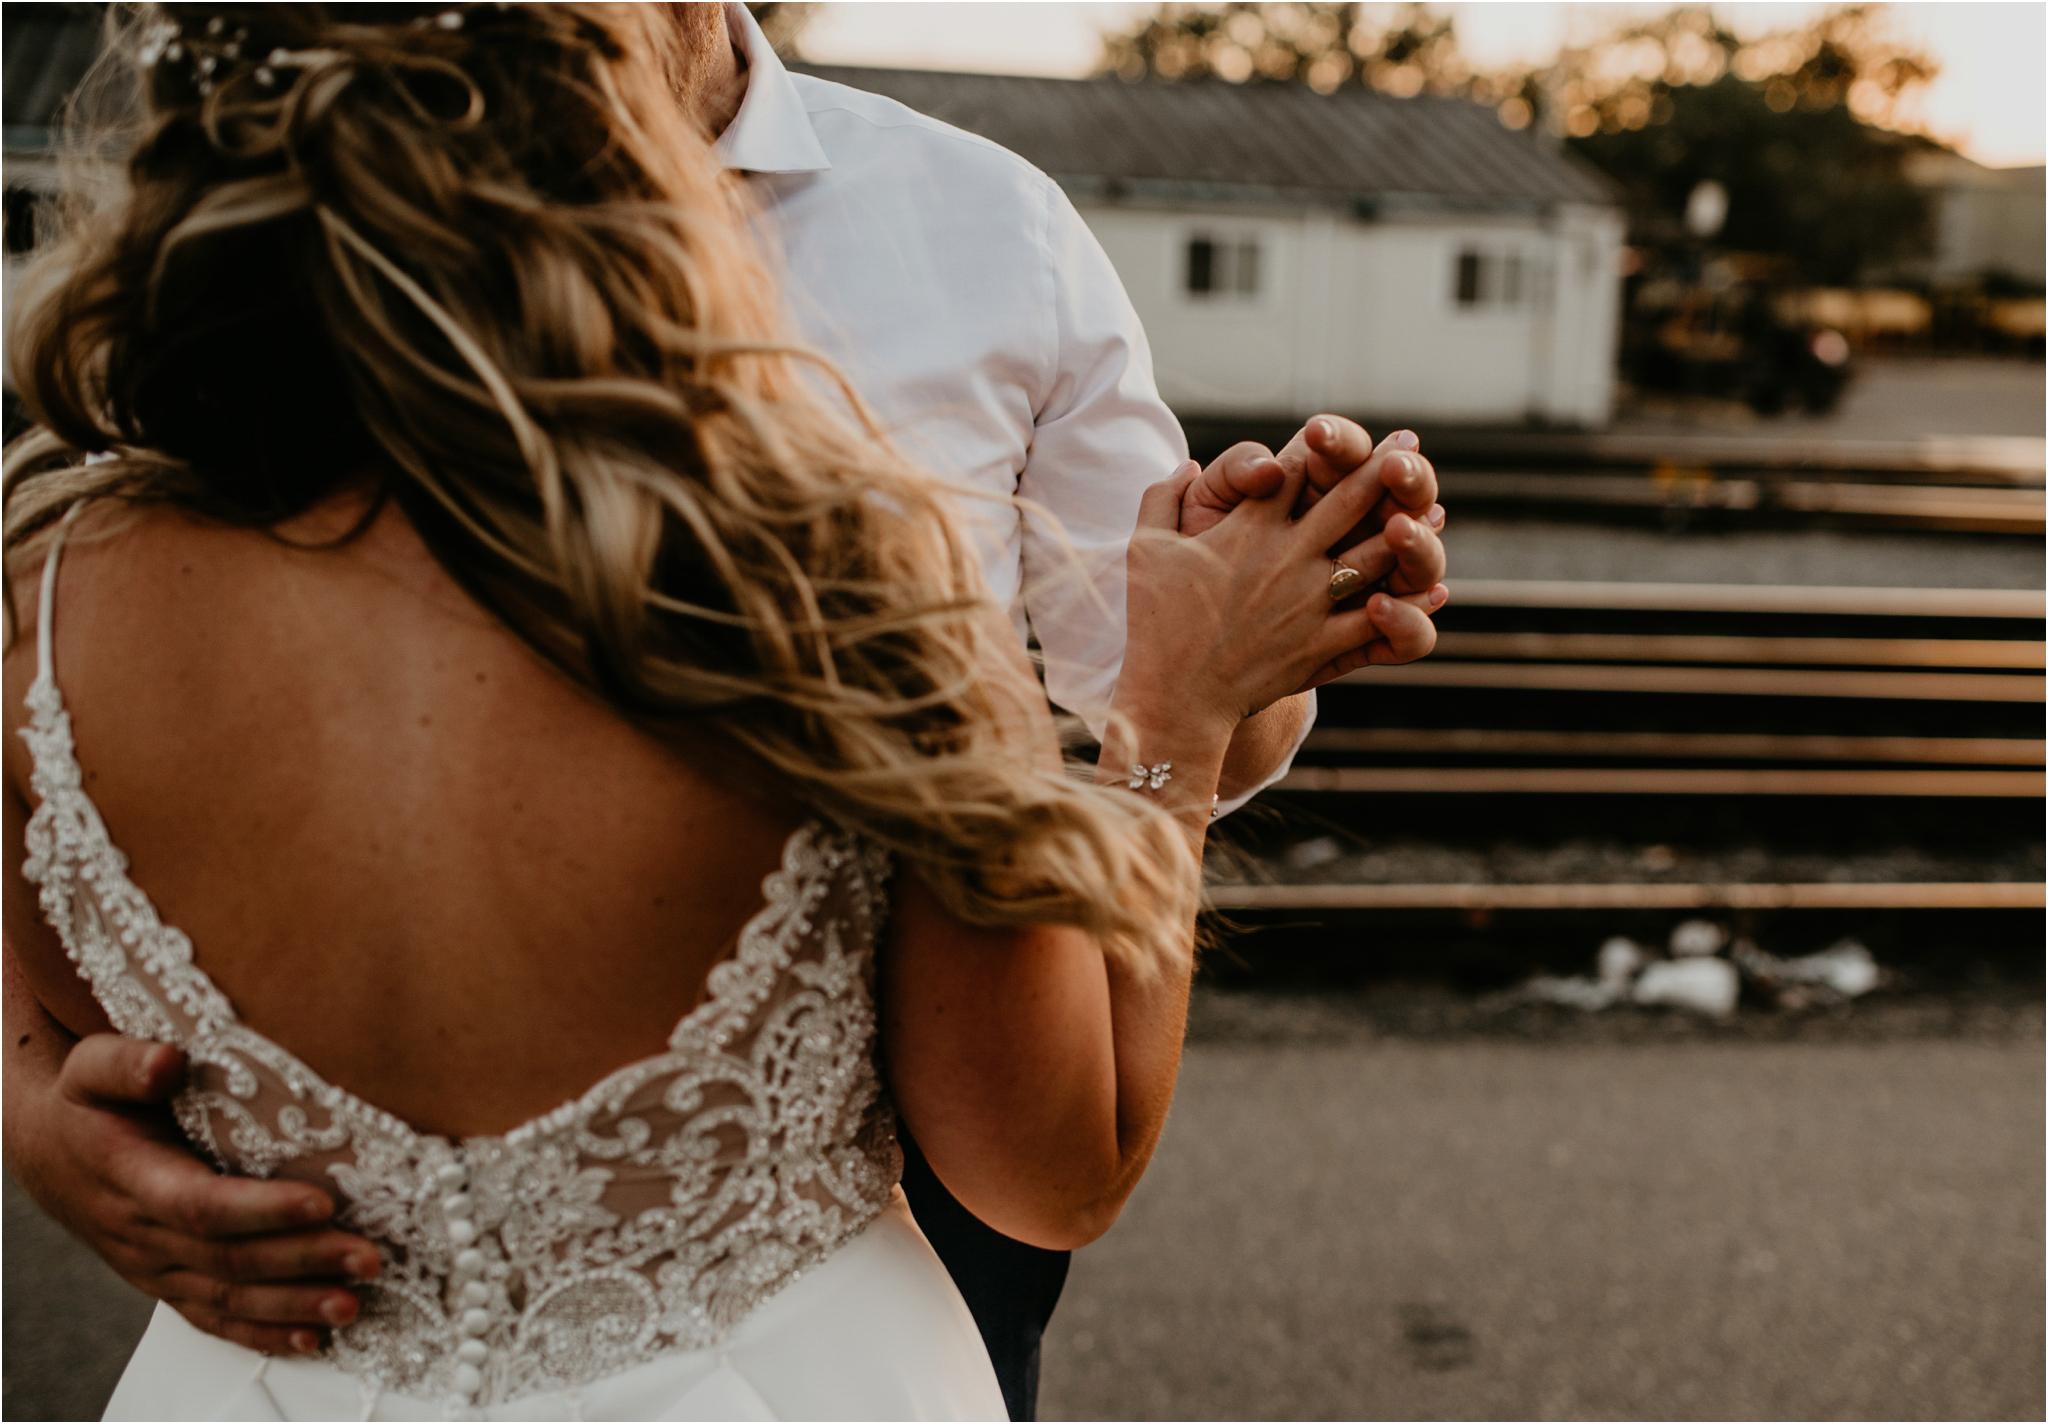 laura-and-matt-metropolist-urban-seattle-wedding-photographer-150.jpg